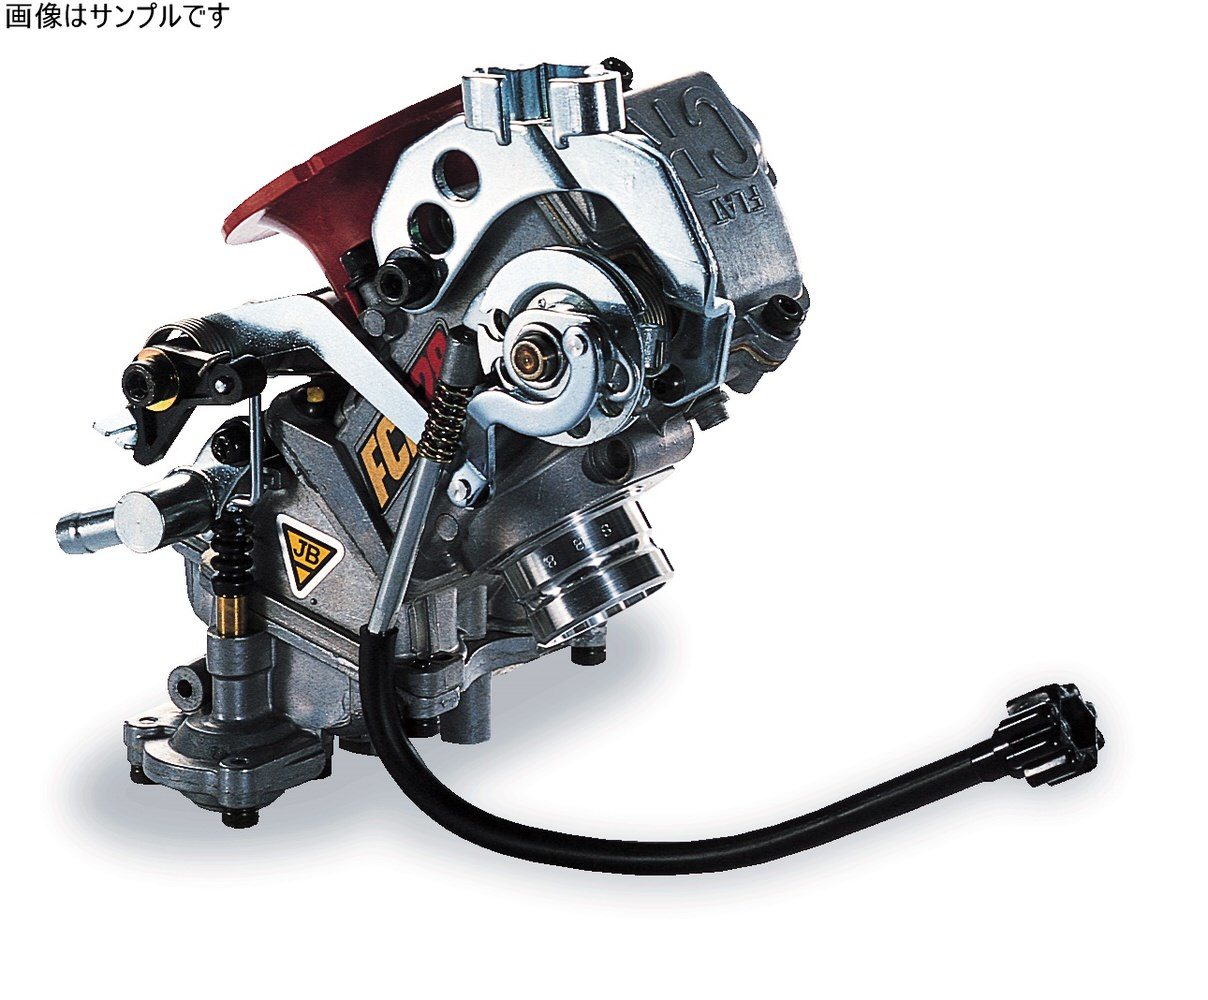 KEIHIN FCRΦ28 キャブレターキット(ホリゾンタル) JB POWER(BITO R&D) モンキー(MONKEY)